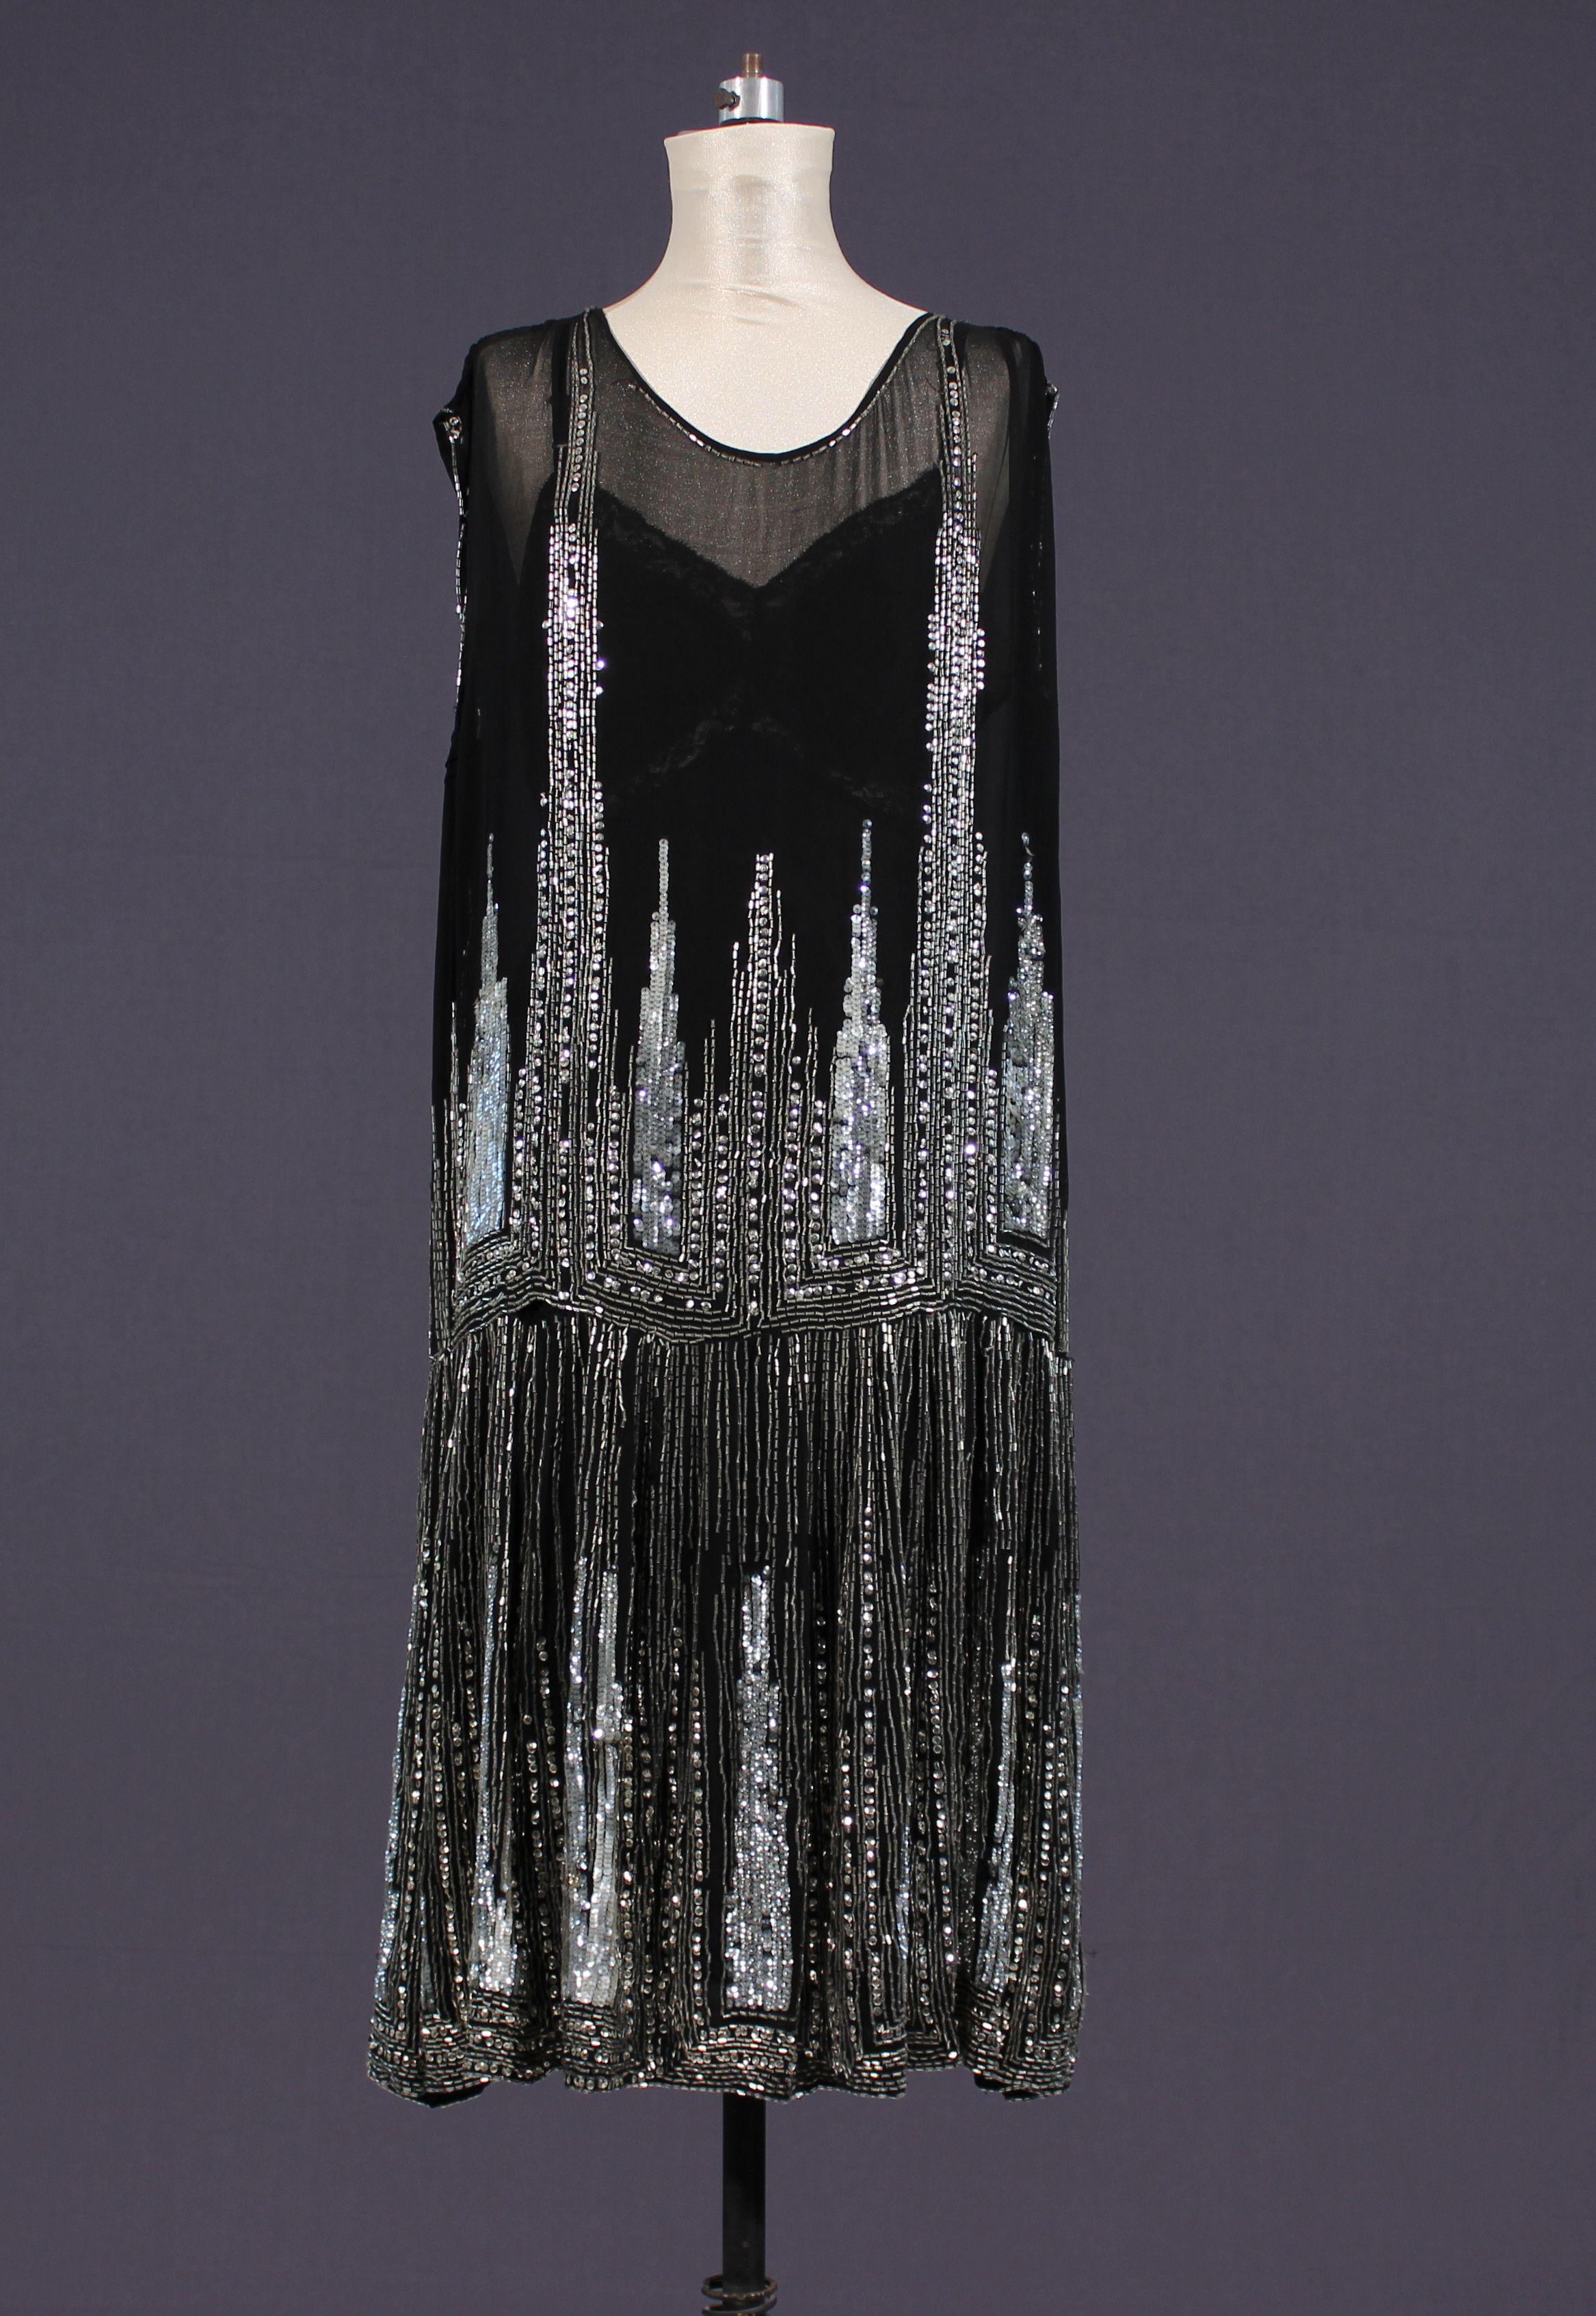 evening gown beaded to resemble the night skyline | Moda Y Estilo _ ...